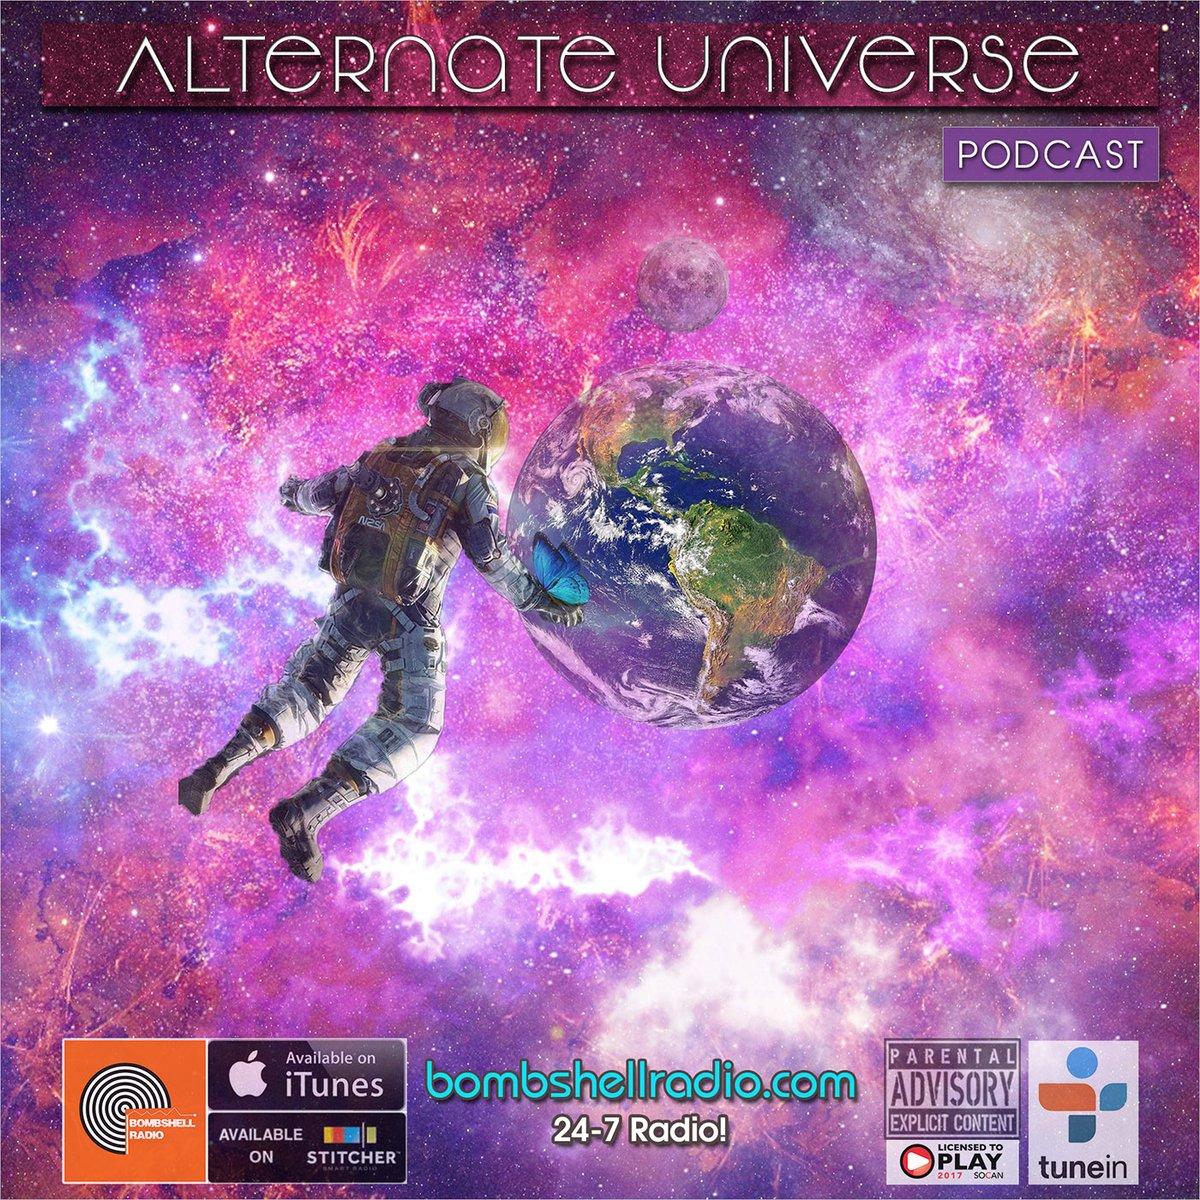 Alternate Universe # 99 Alternate Universe Tuesday's 5pm-6pm EST http://bombshellradio.com  Alternate Universe Today's Bombshell (Bombshell Radio)#AlternateUniverse, #indierock, #BombshellRadio, #alternative, #rock, #Classics, #Radioshow, #NewMusic http://bombshellradio.com/alternate-universe-99/…pic.twitter.com/ES6nUIojeb